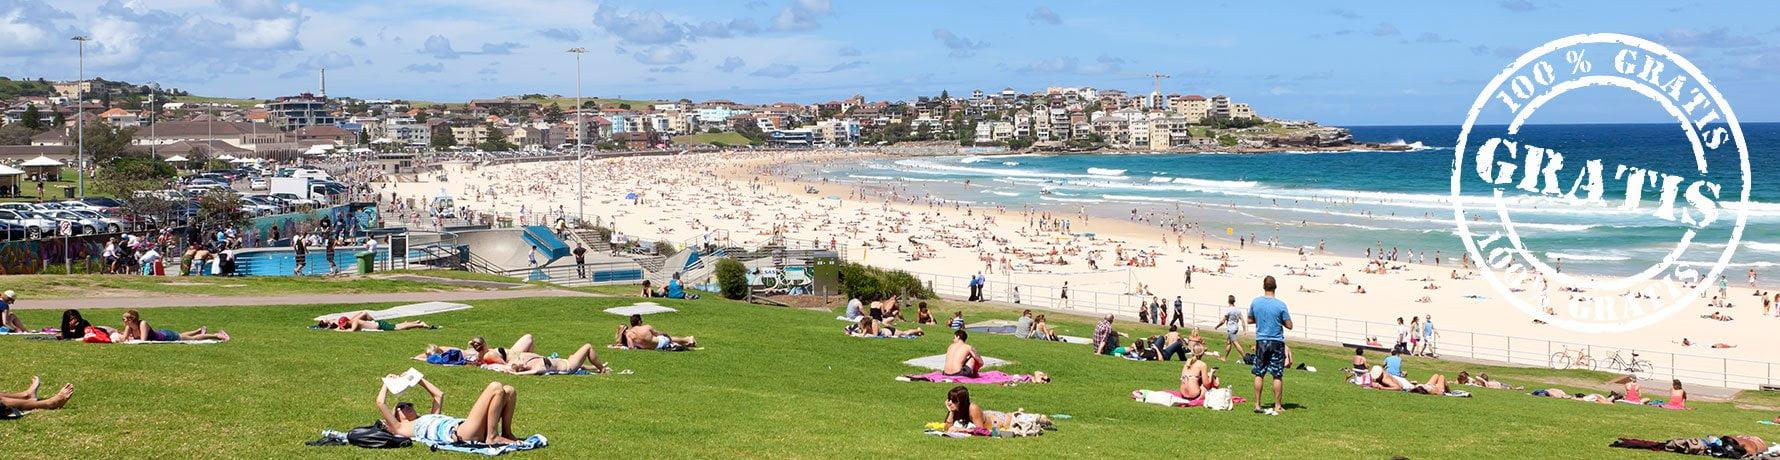 Cosa fare gratis a Sydney